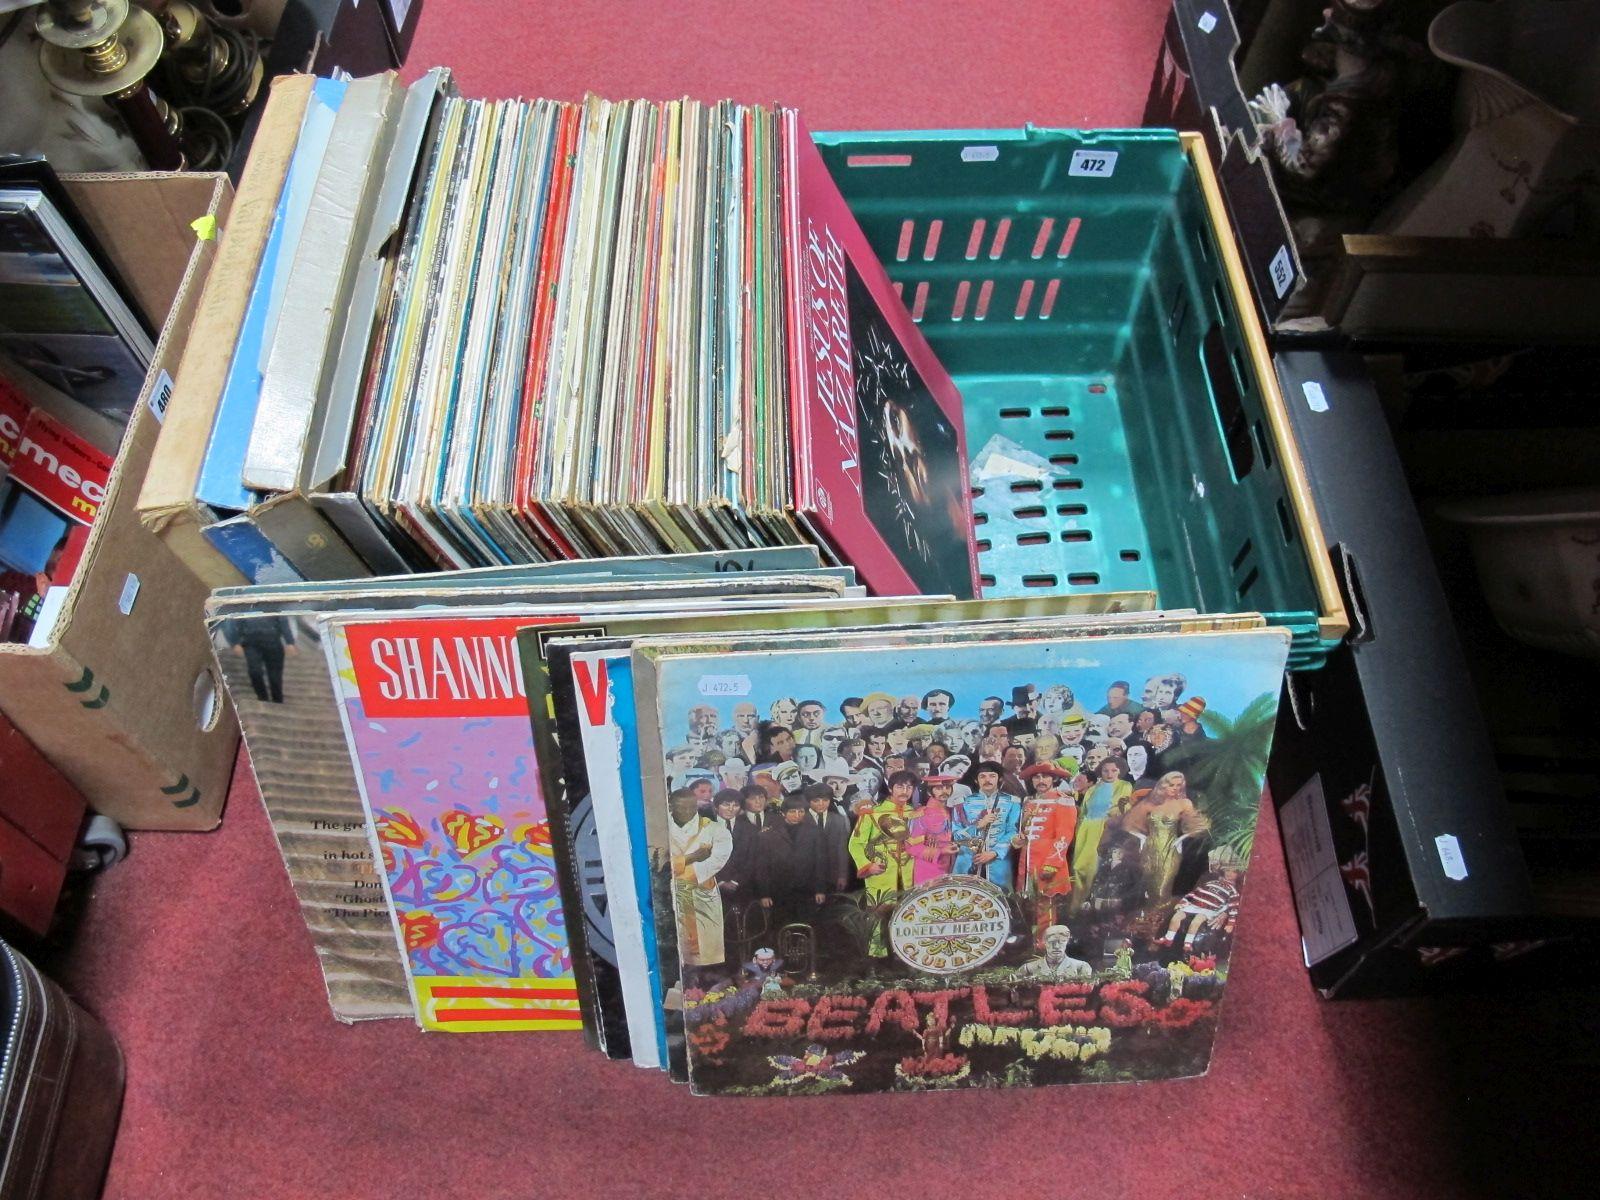 Lot 472 - LP's to include Beatles, 10CC, Wanda Jackson, Neil Diamond, etc:- One Box